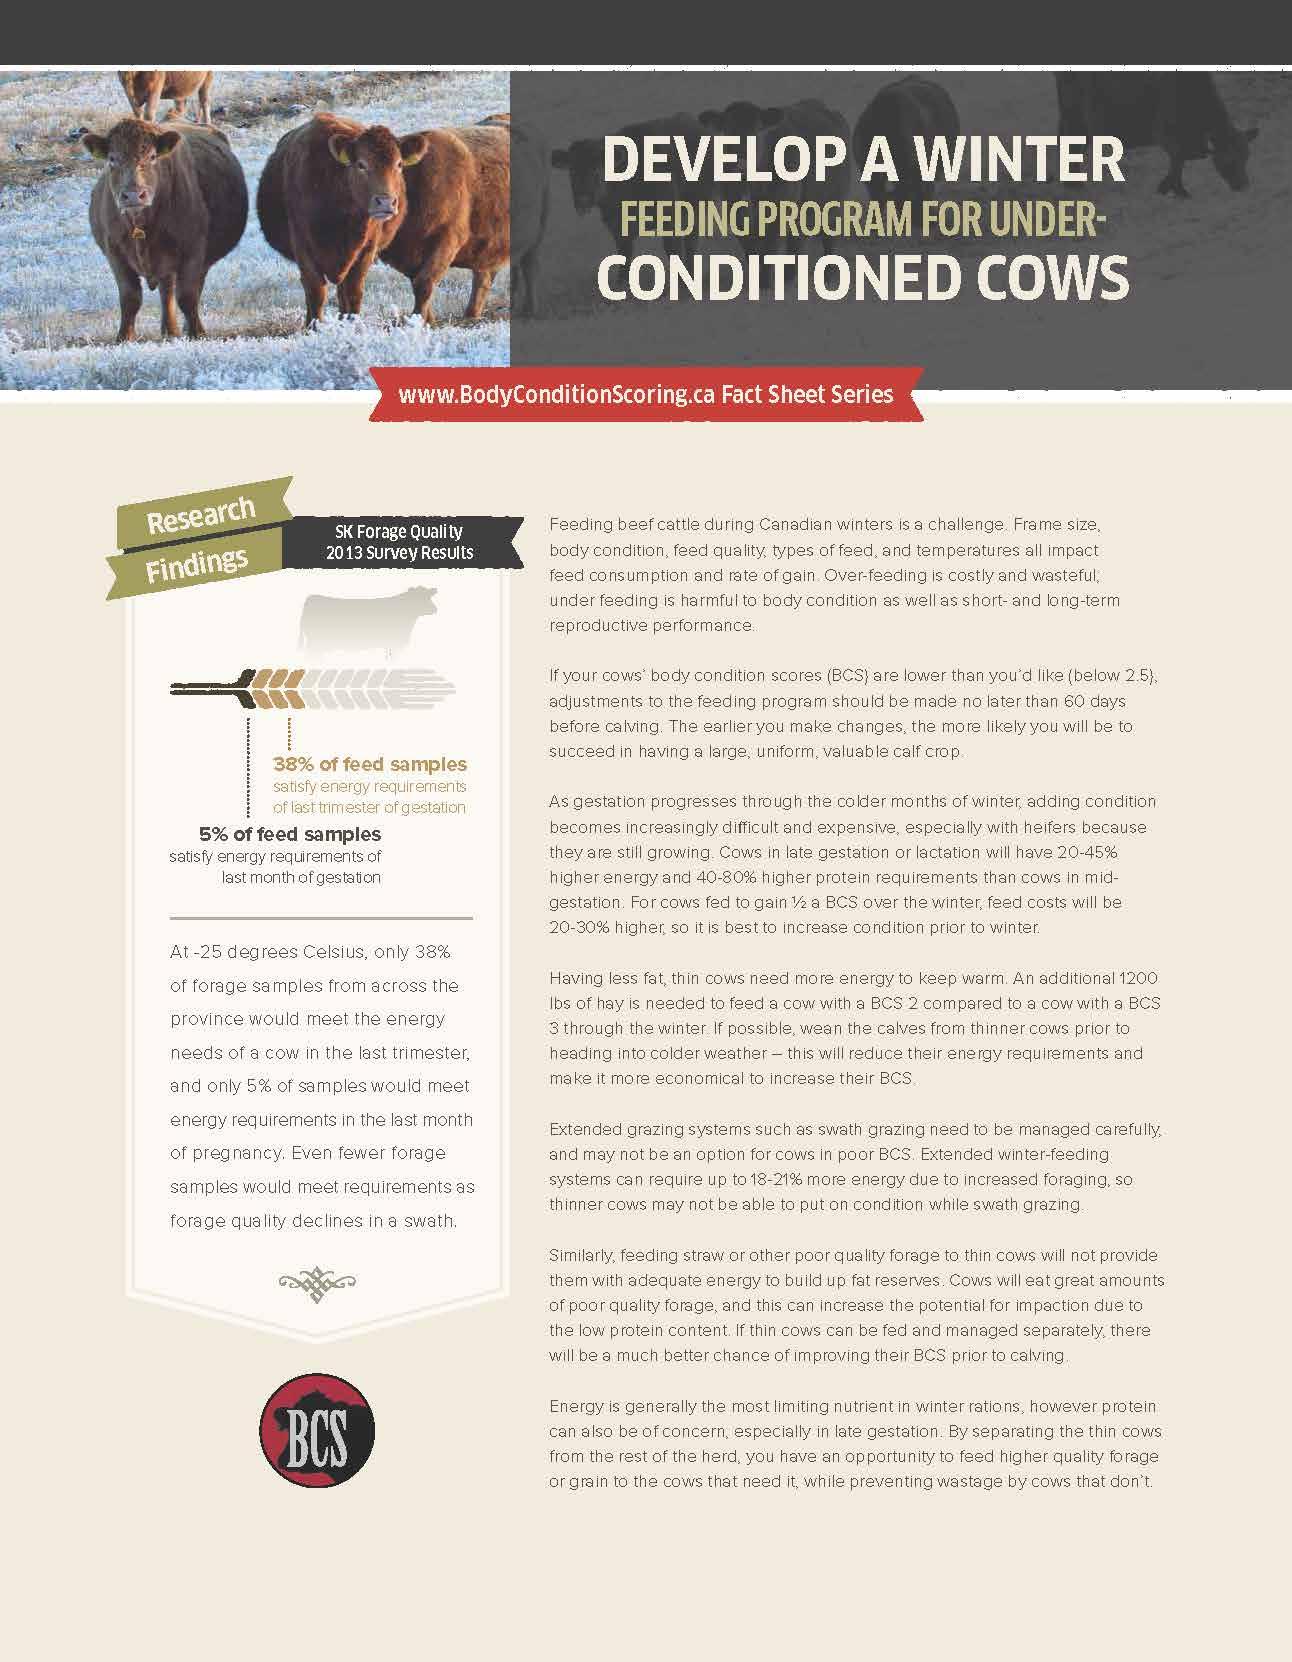 Cattle Herd Management Spreadsheet Throughout Body